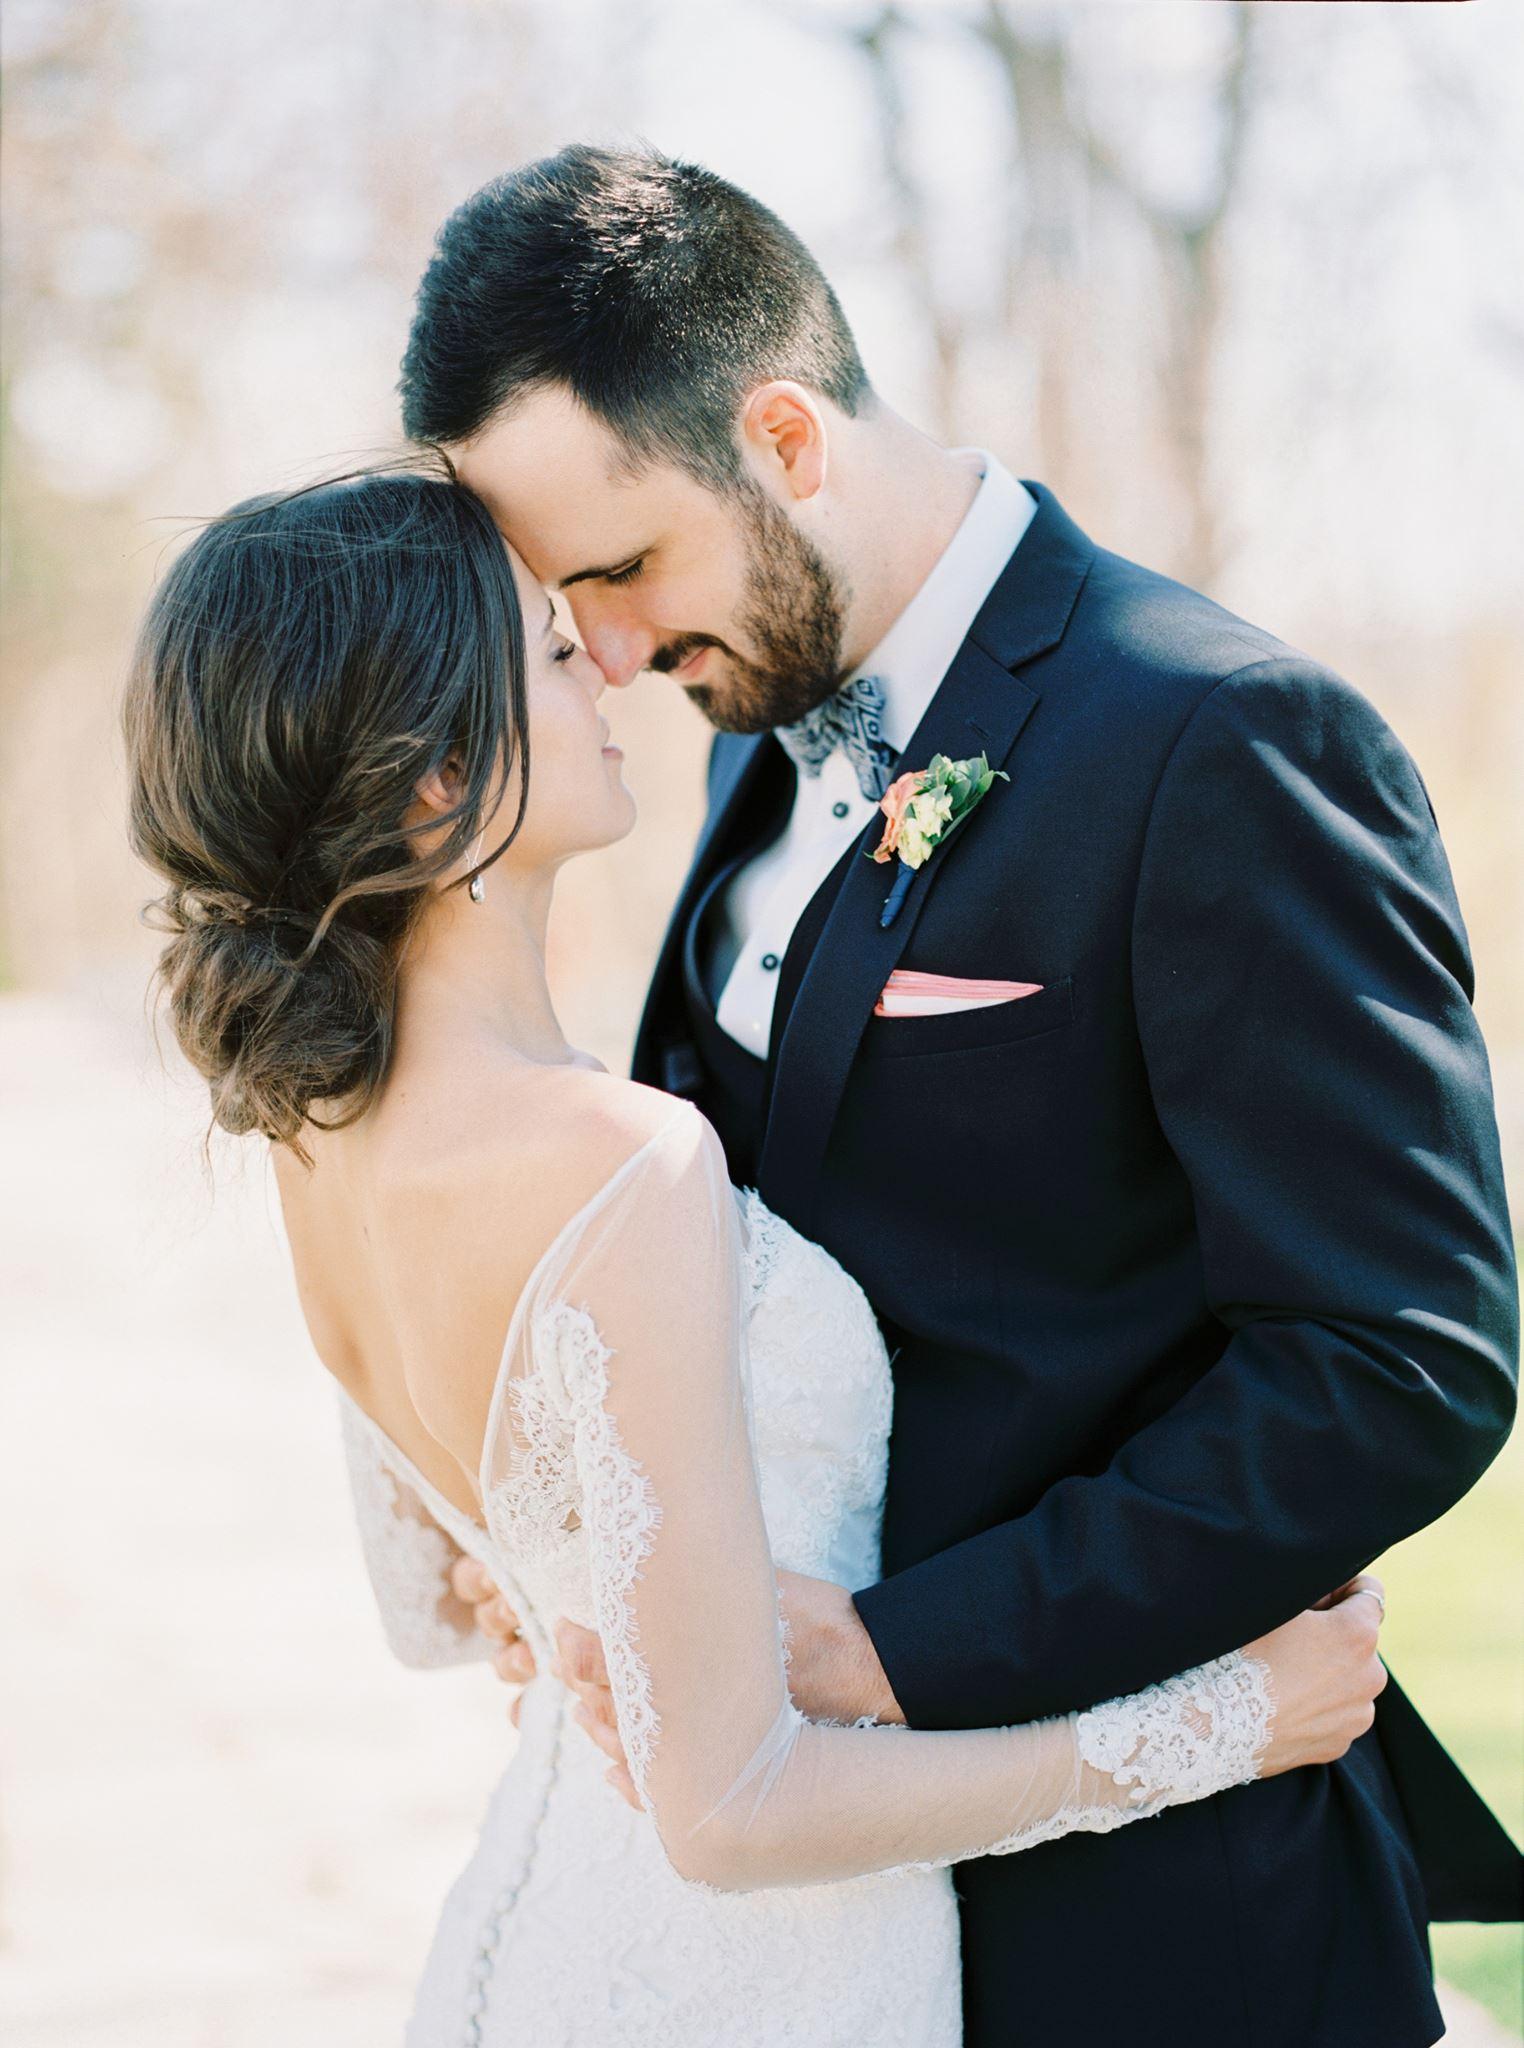 Jordan Raycroft Danielle Raycroft Wedding Kleinburg